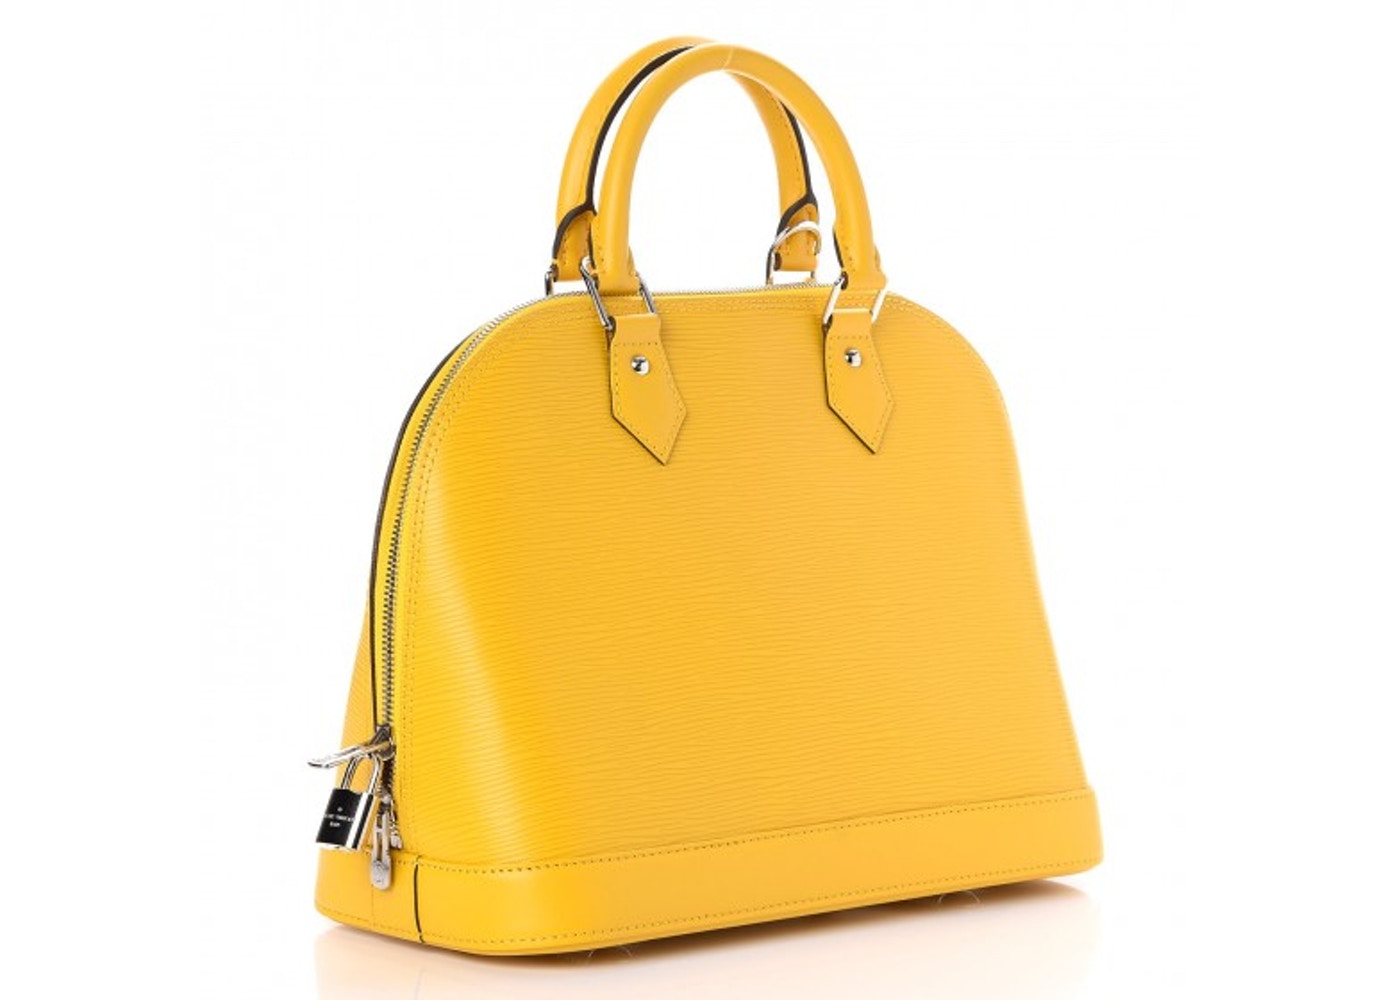 f58527ebc251 Buy   Sell Louis Vuitton Alma Handbags